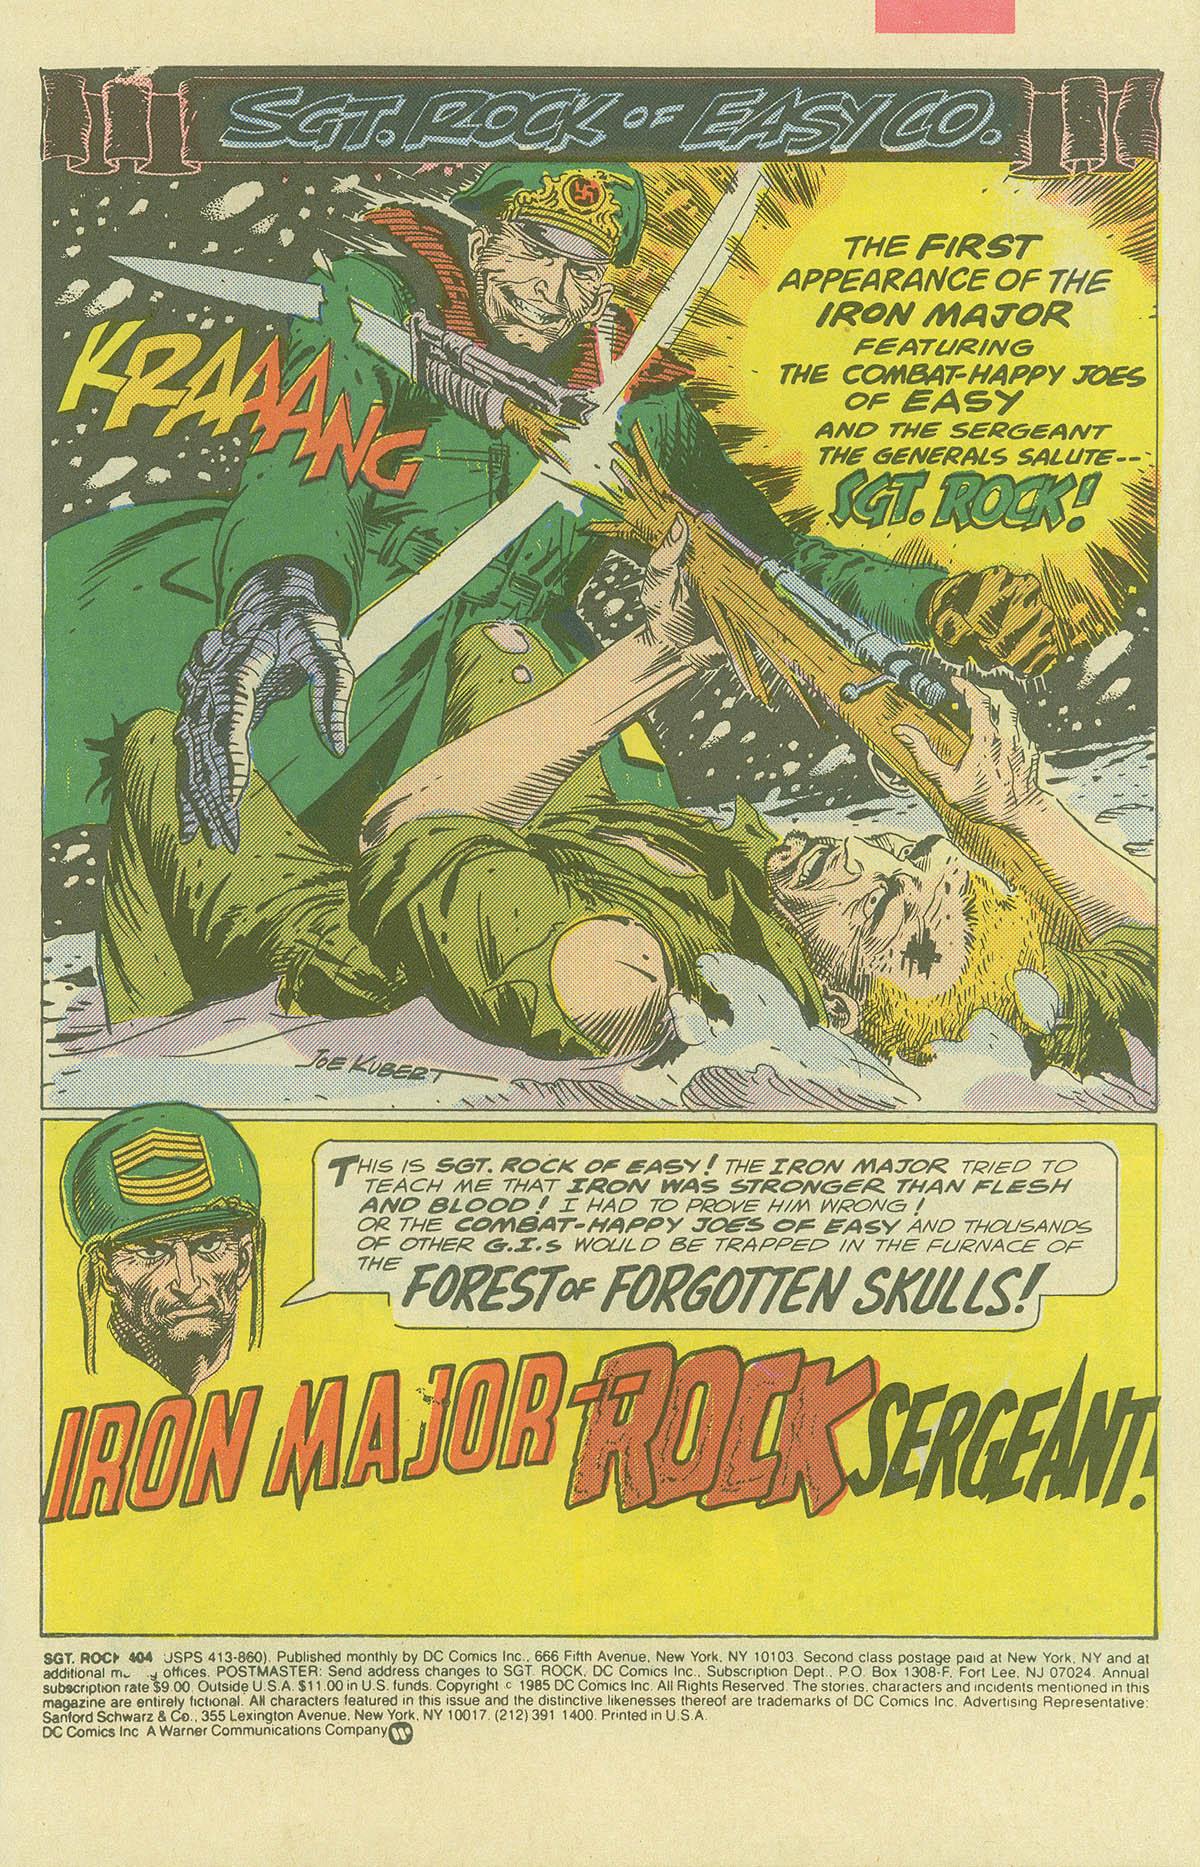 Read online Sgt. Rock comic -  Issue #404 - 3